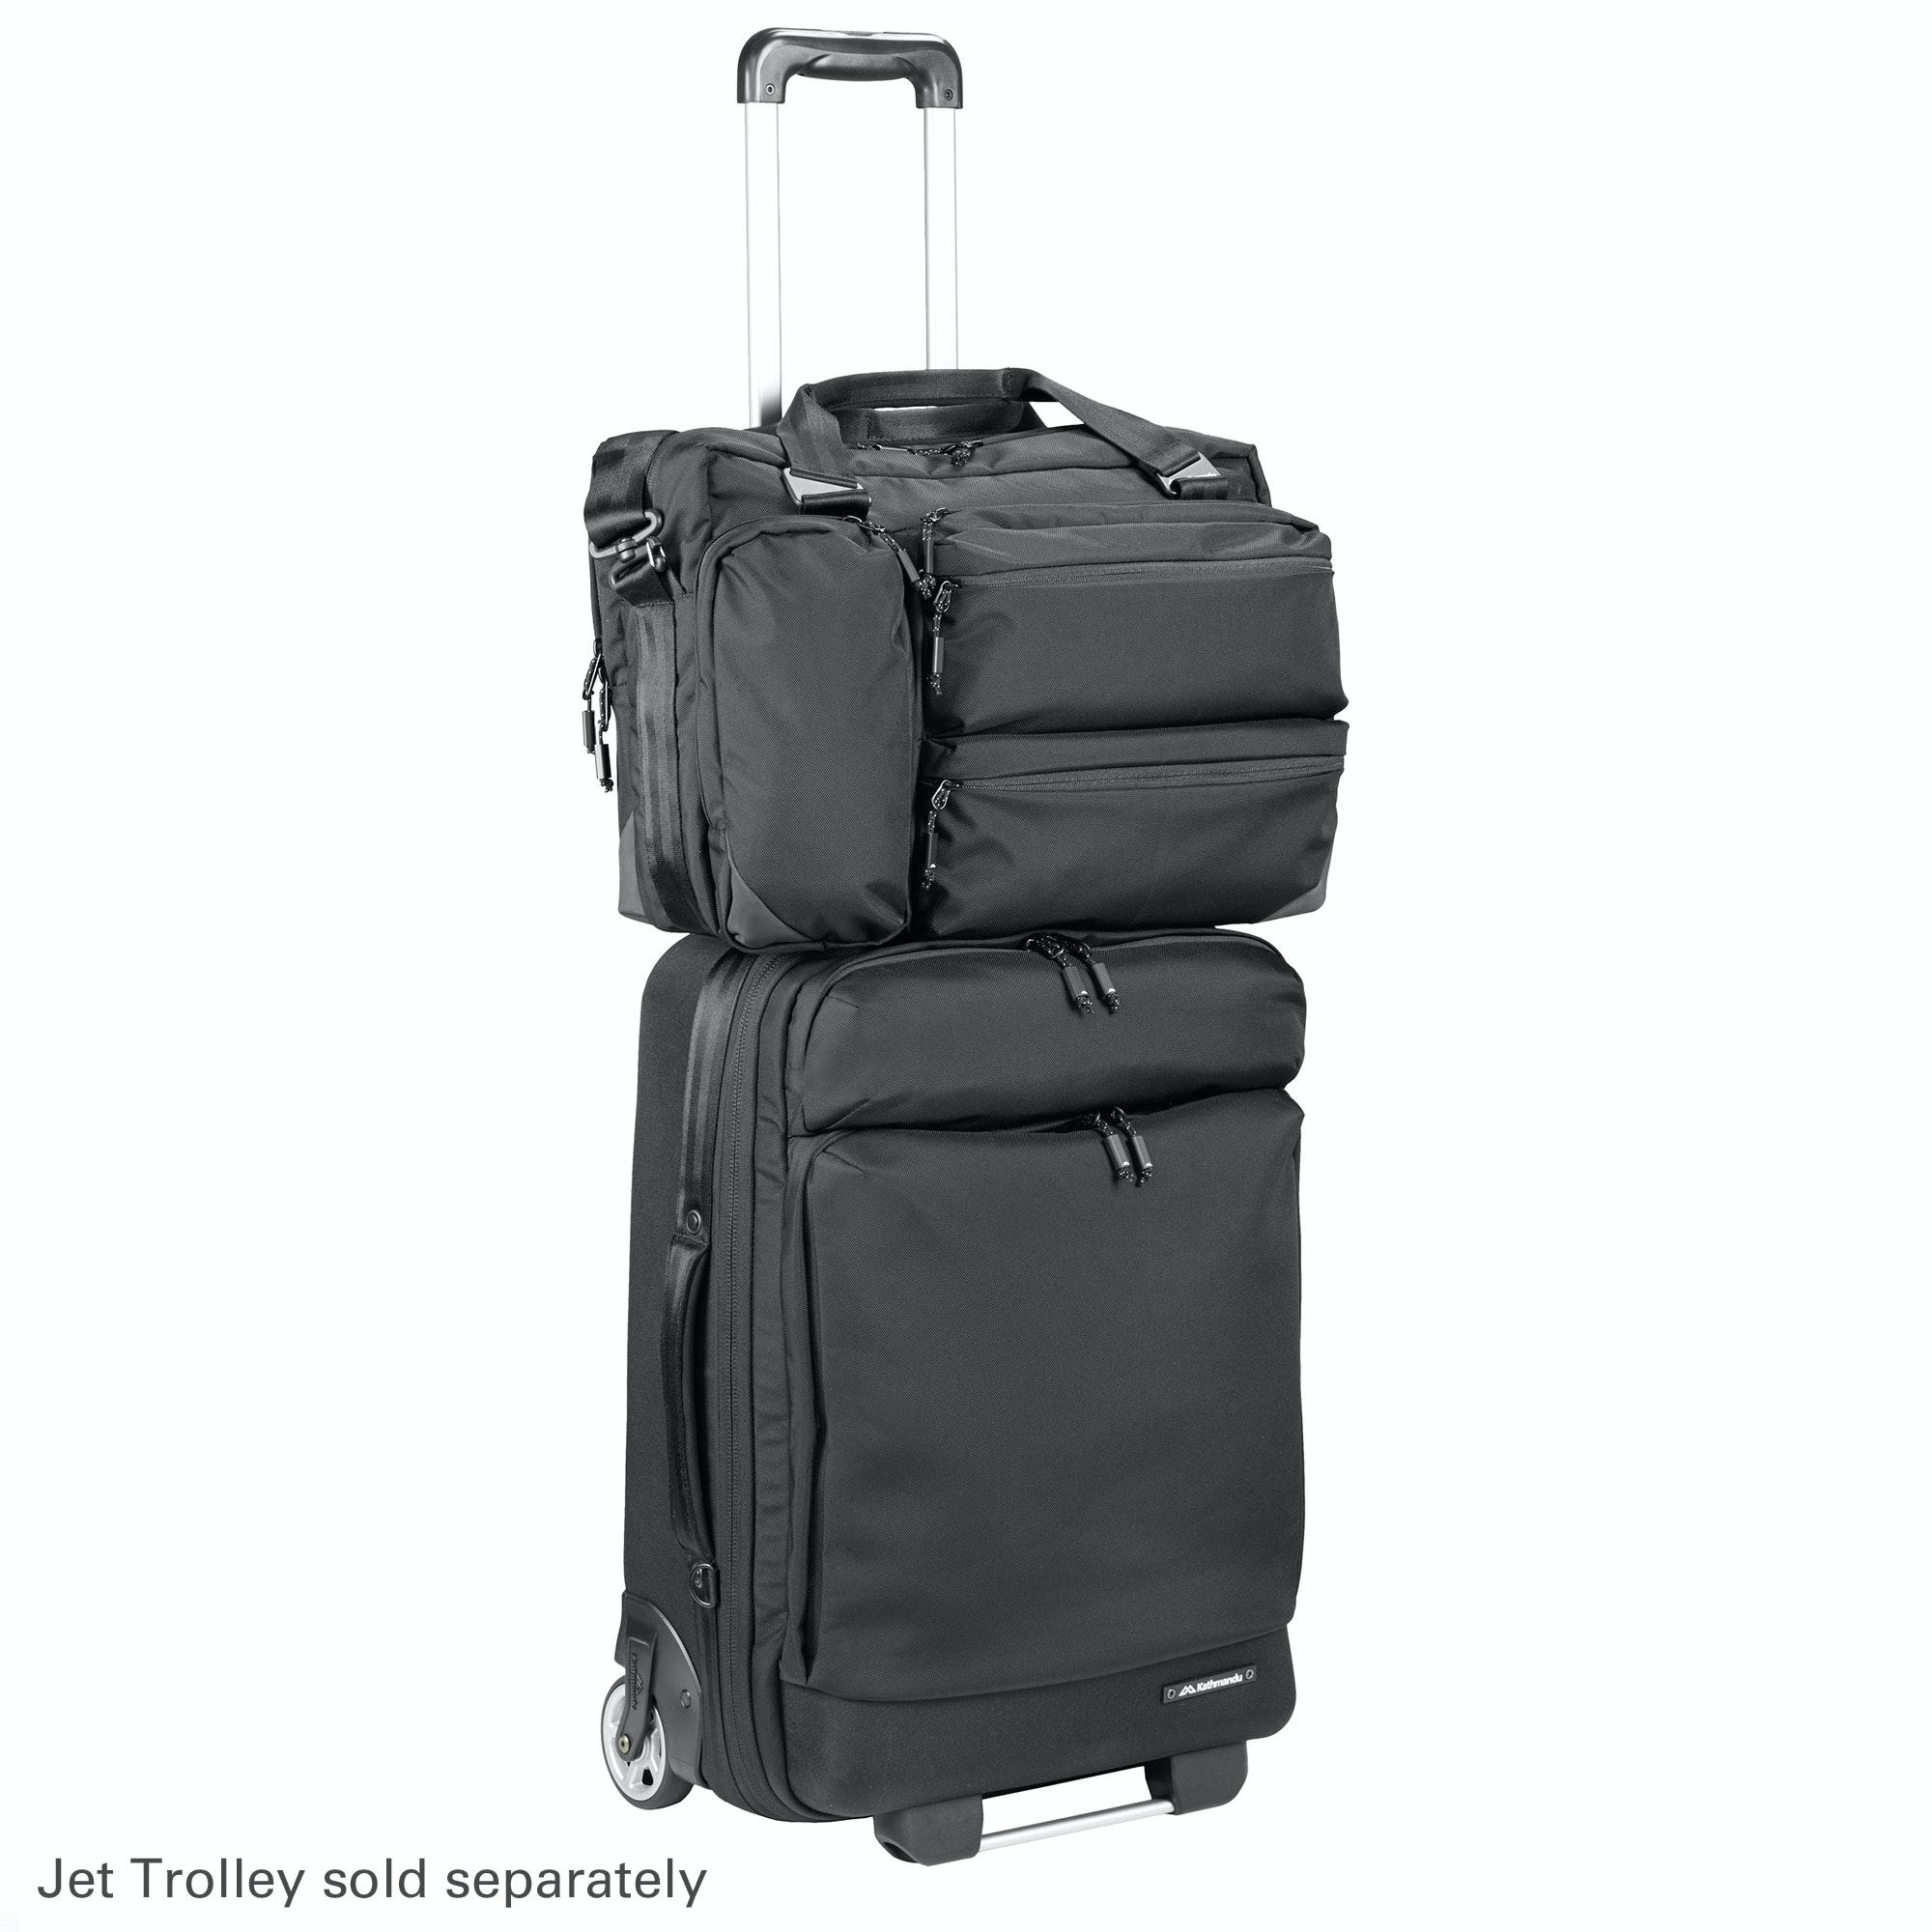 Jet Brief 22L Carry On Luggage Laptop Bag - Black